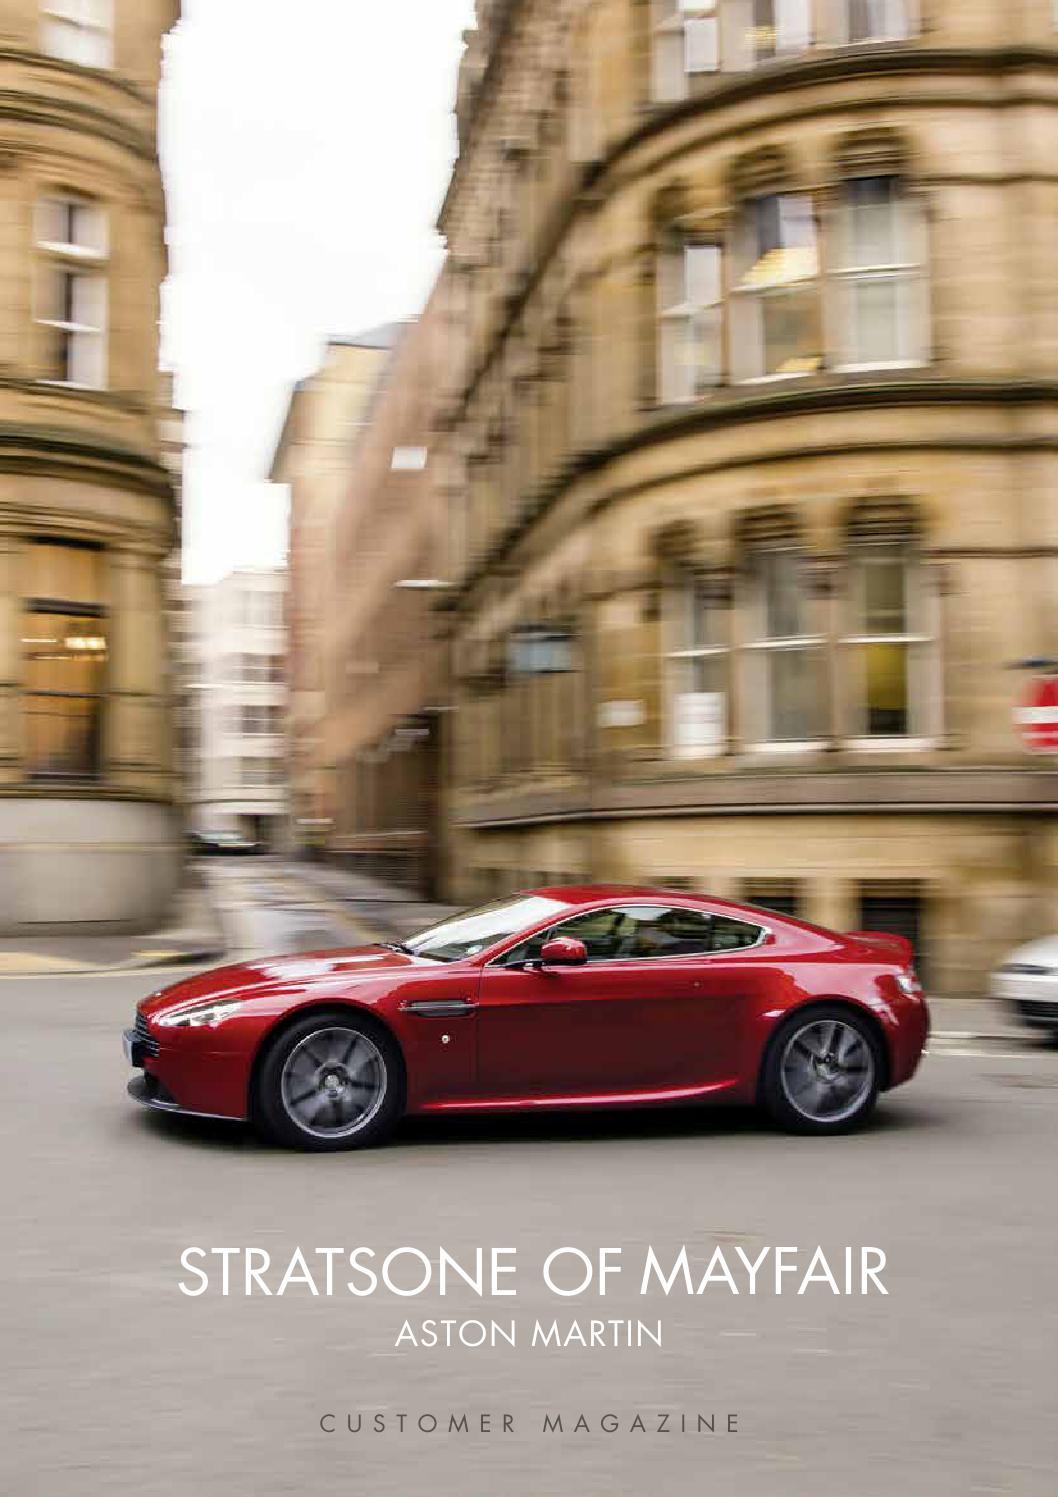 Page on 2014 Aston Martin V12 Vantage S Roadster